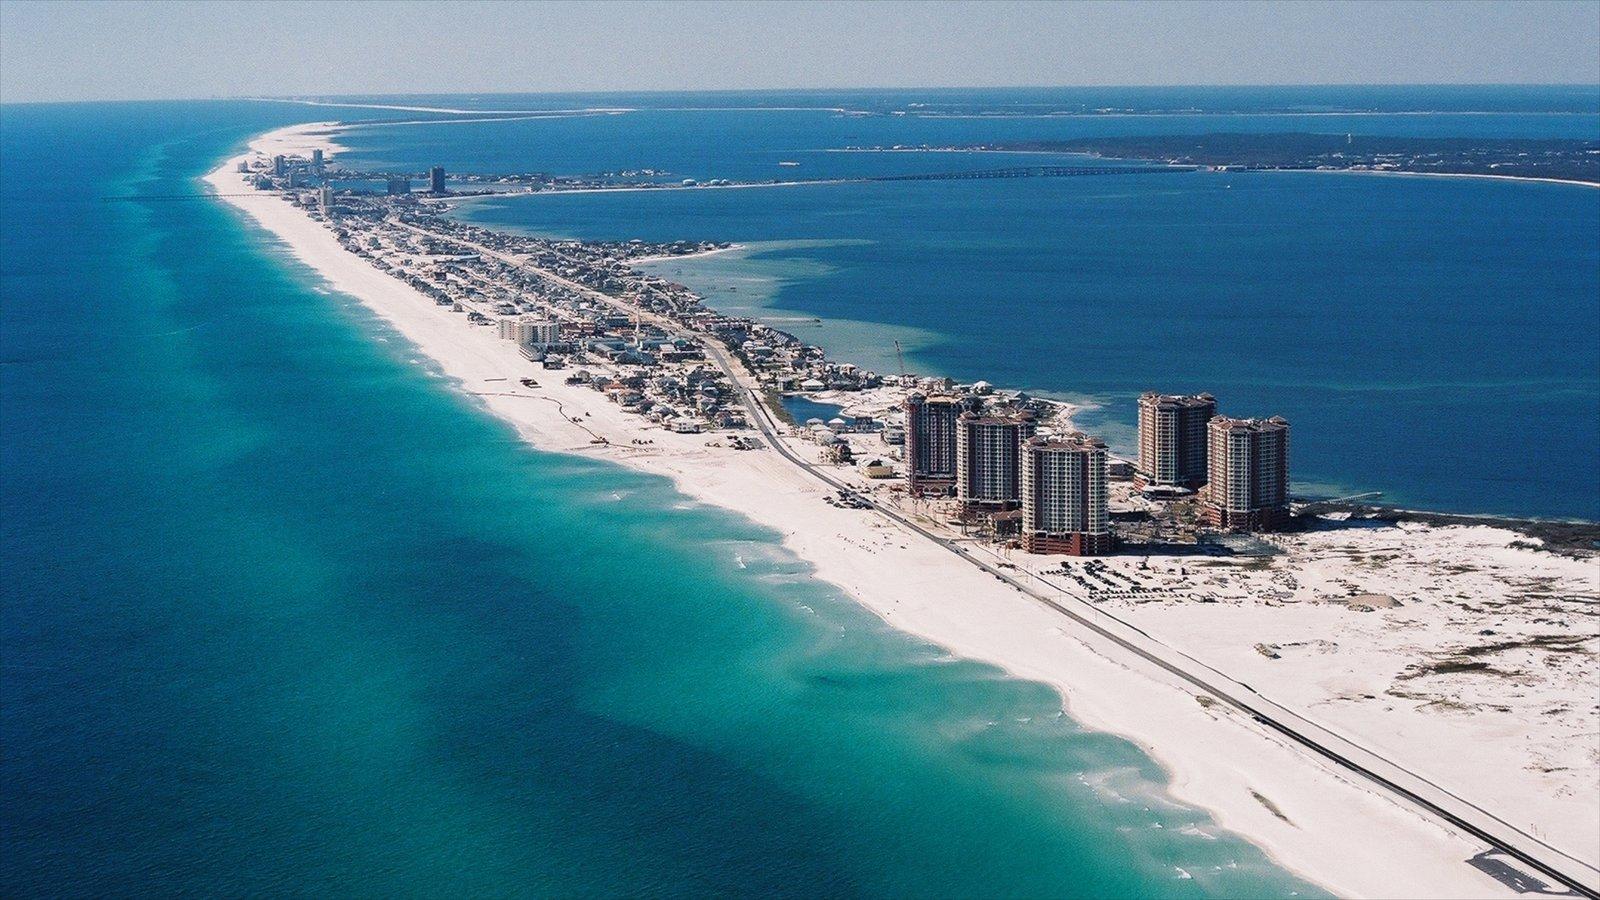 Pensacola Beach featuring a beach, skyline and a coastal town